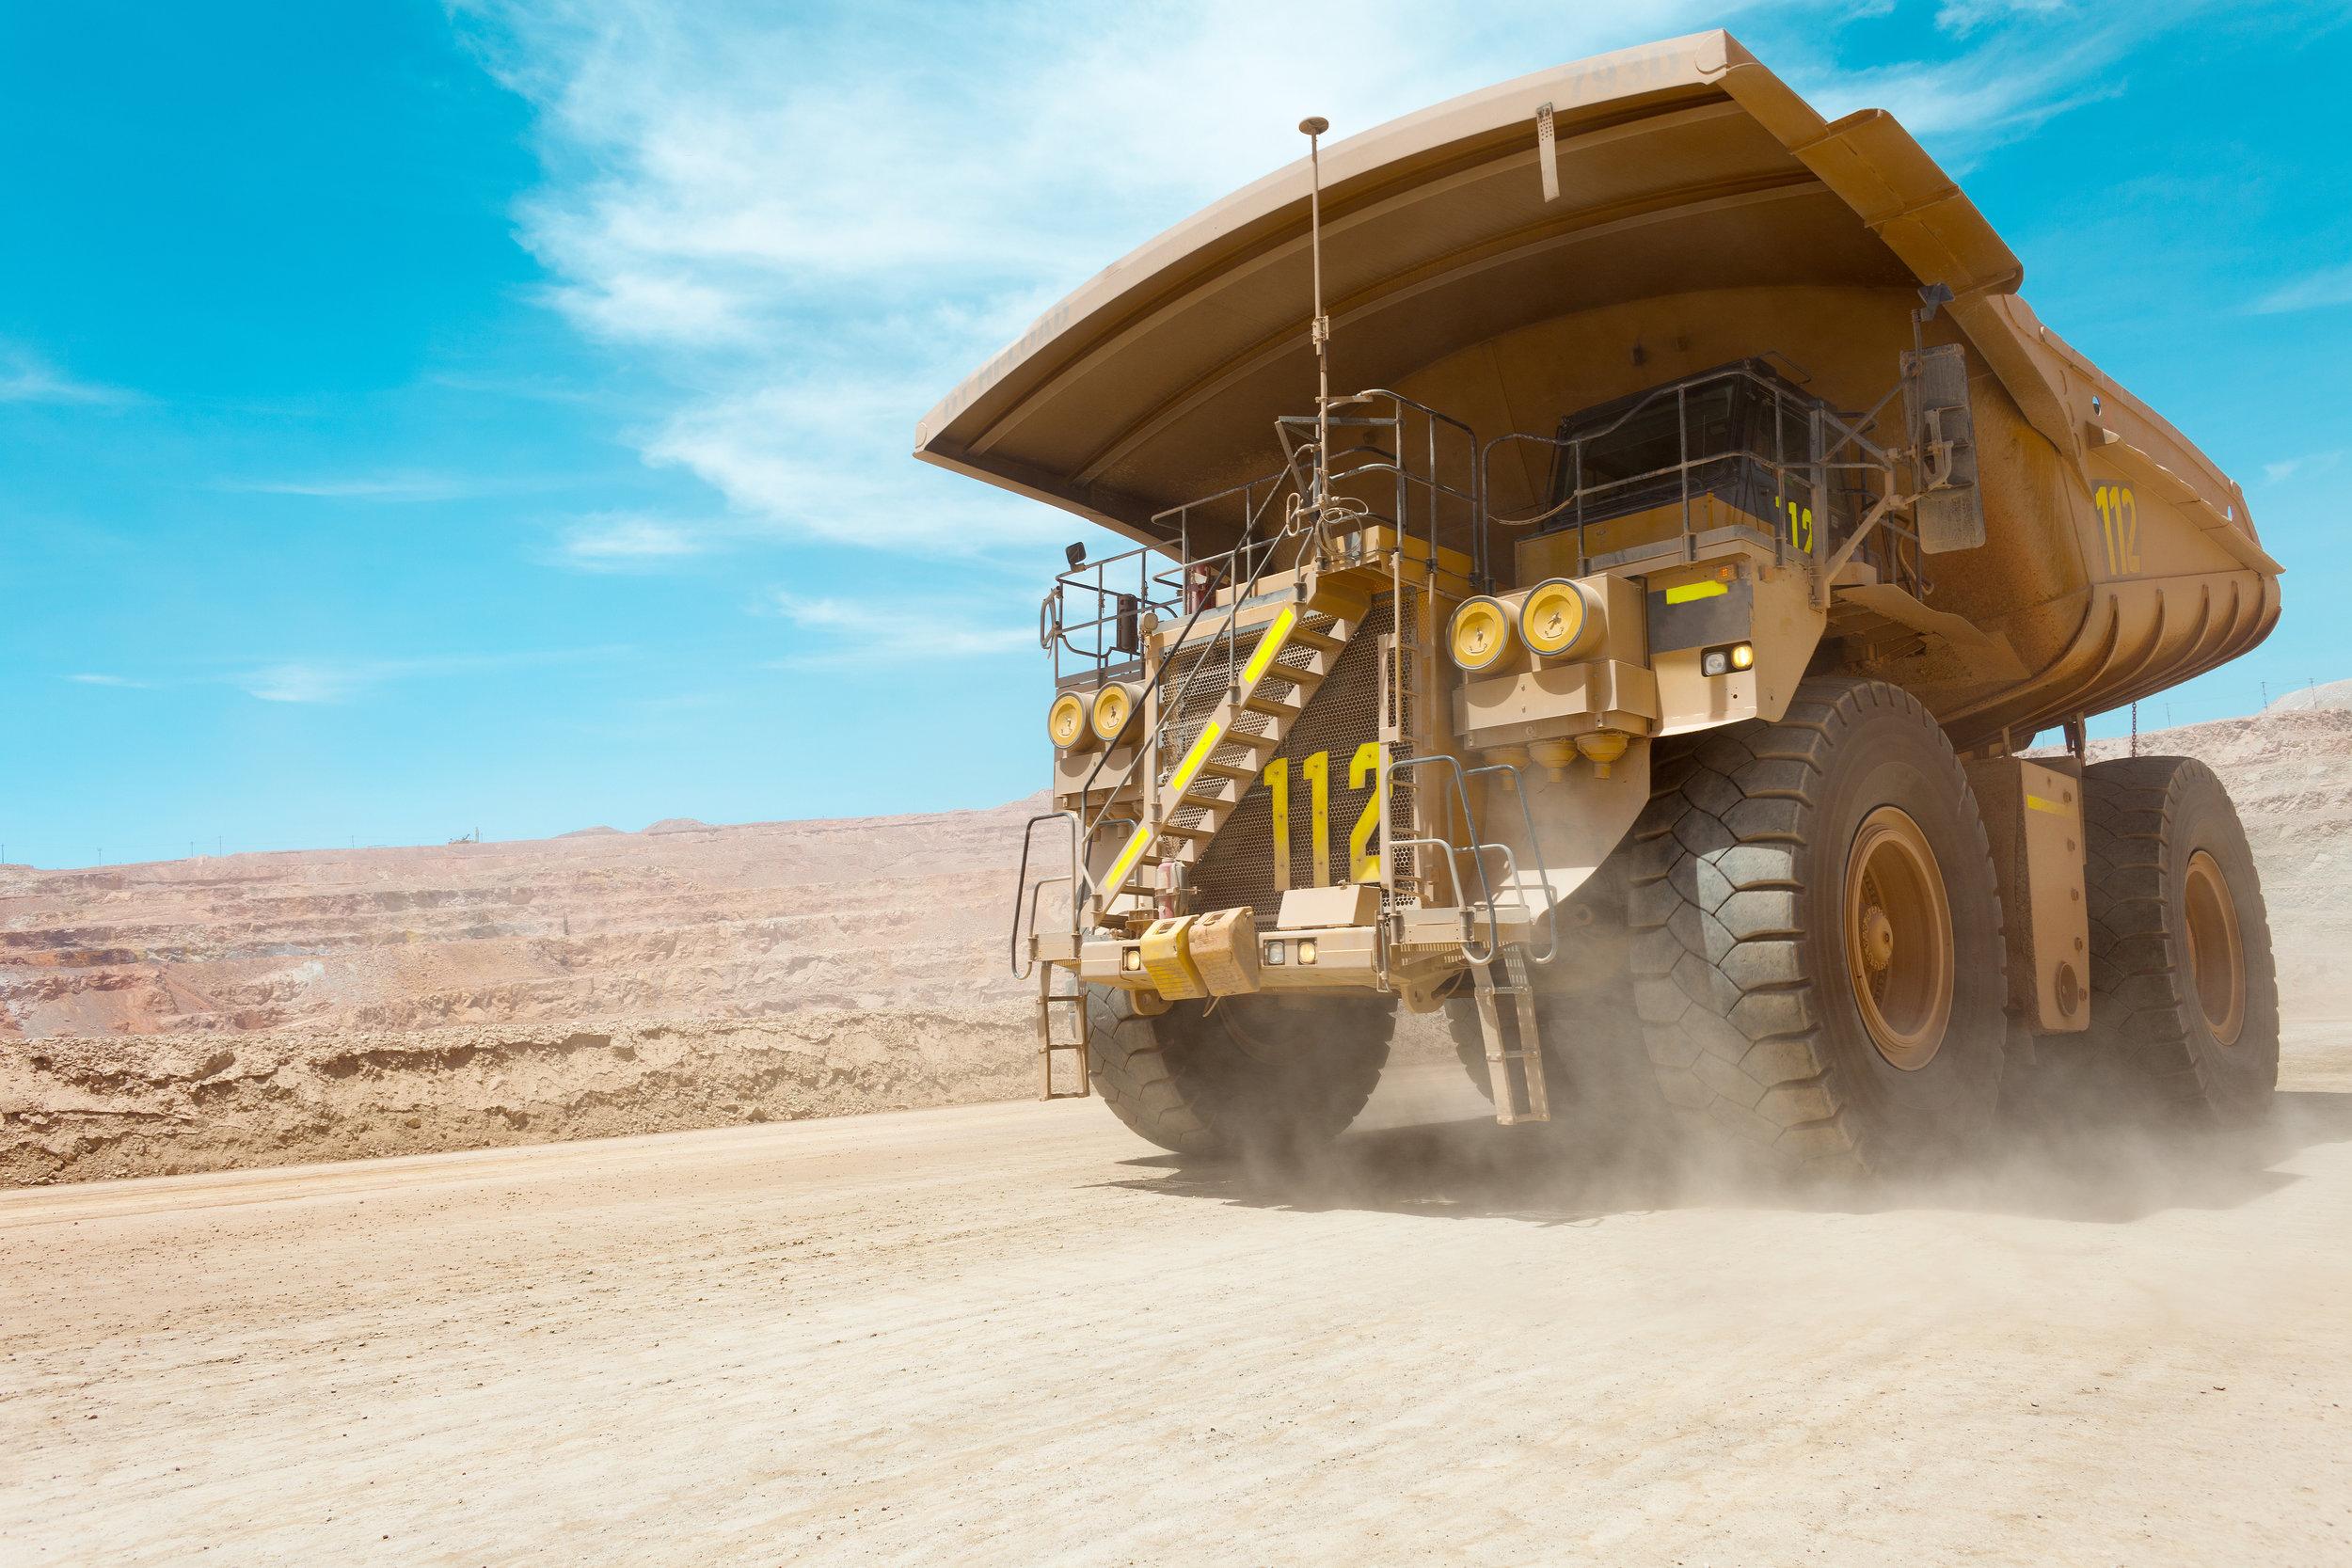 Análisis de minas informados de combustible